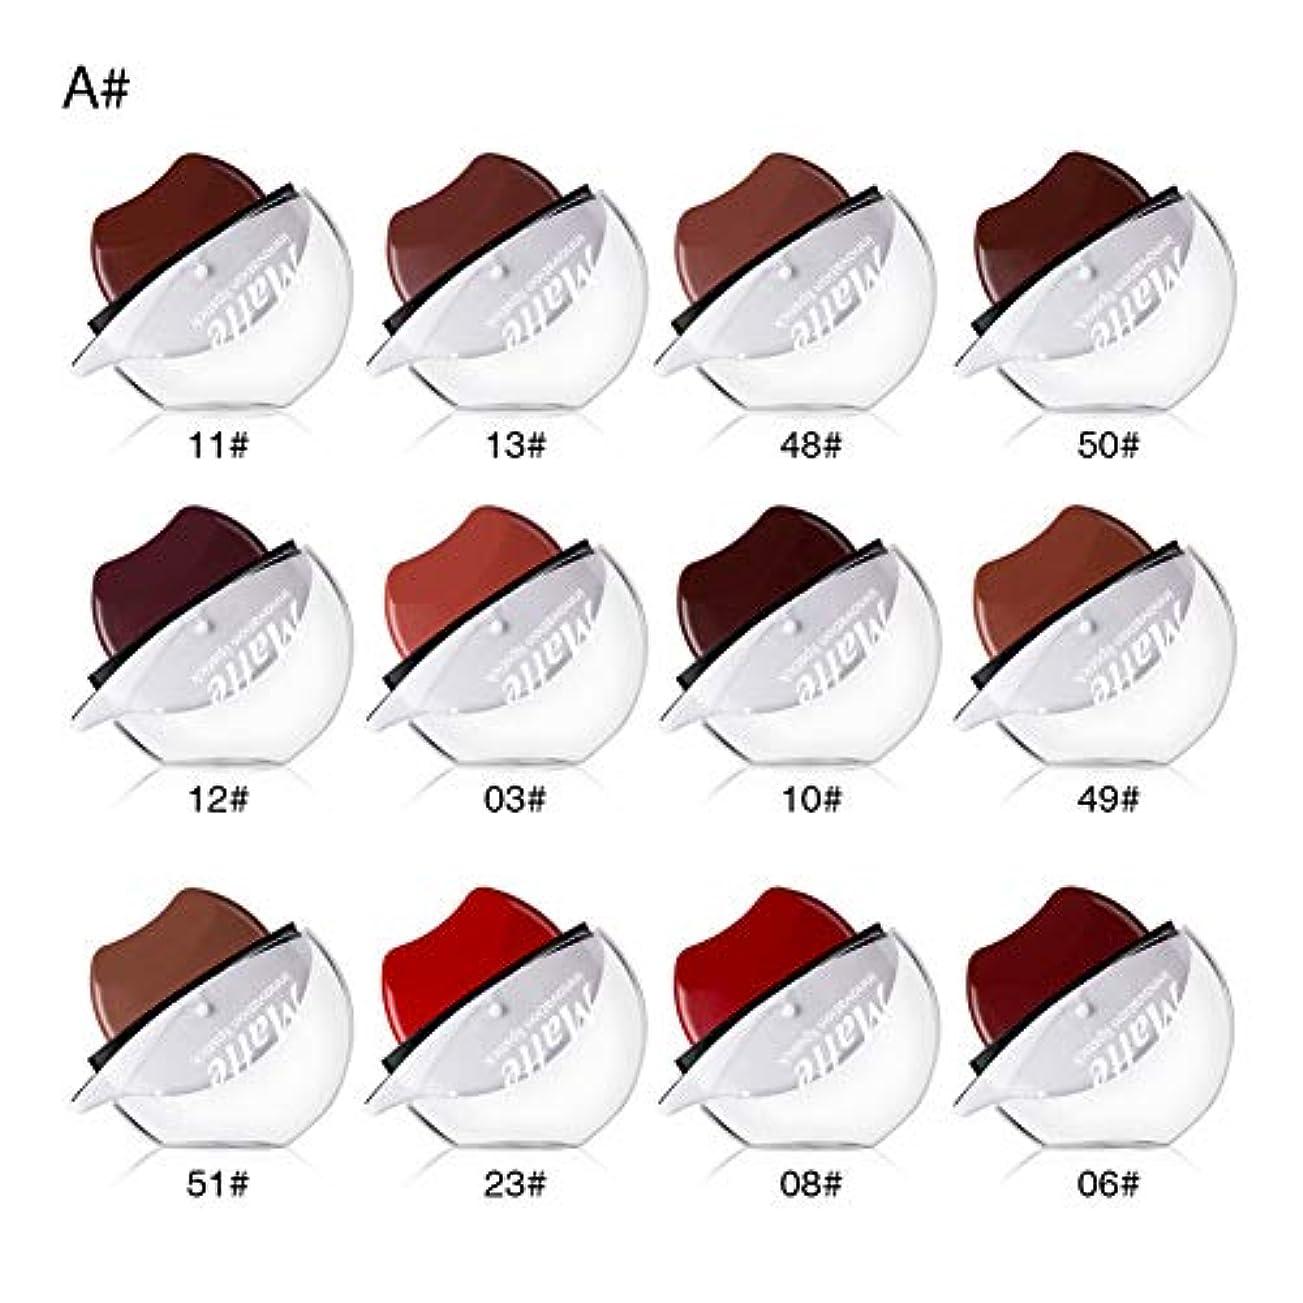 MeterMall 12色長続きがする怠惰な唇の形の口紅防水長続きがする保湿の口紅 A(12色/セット)